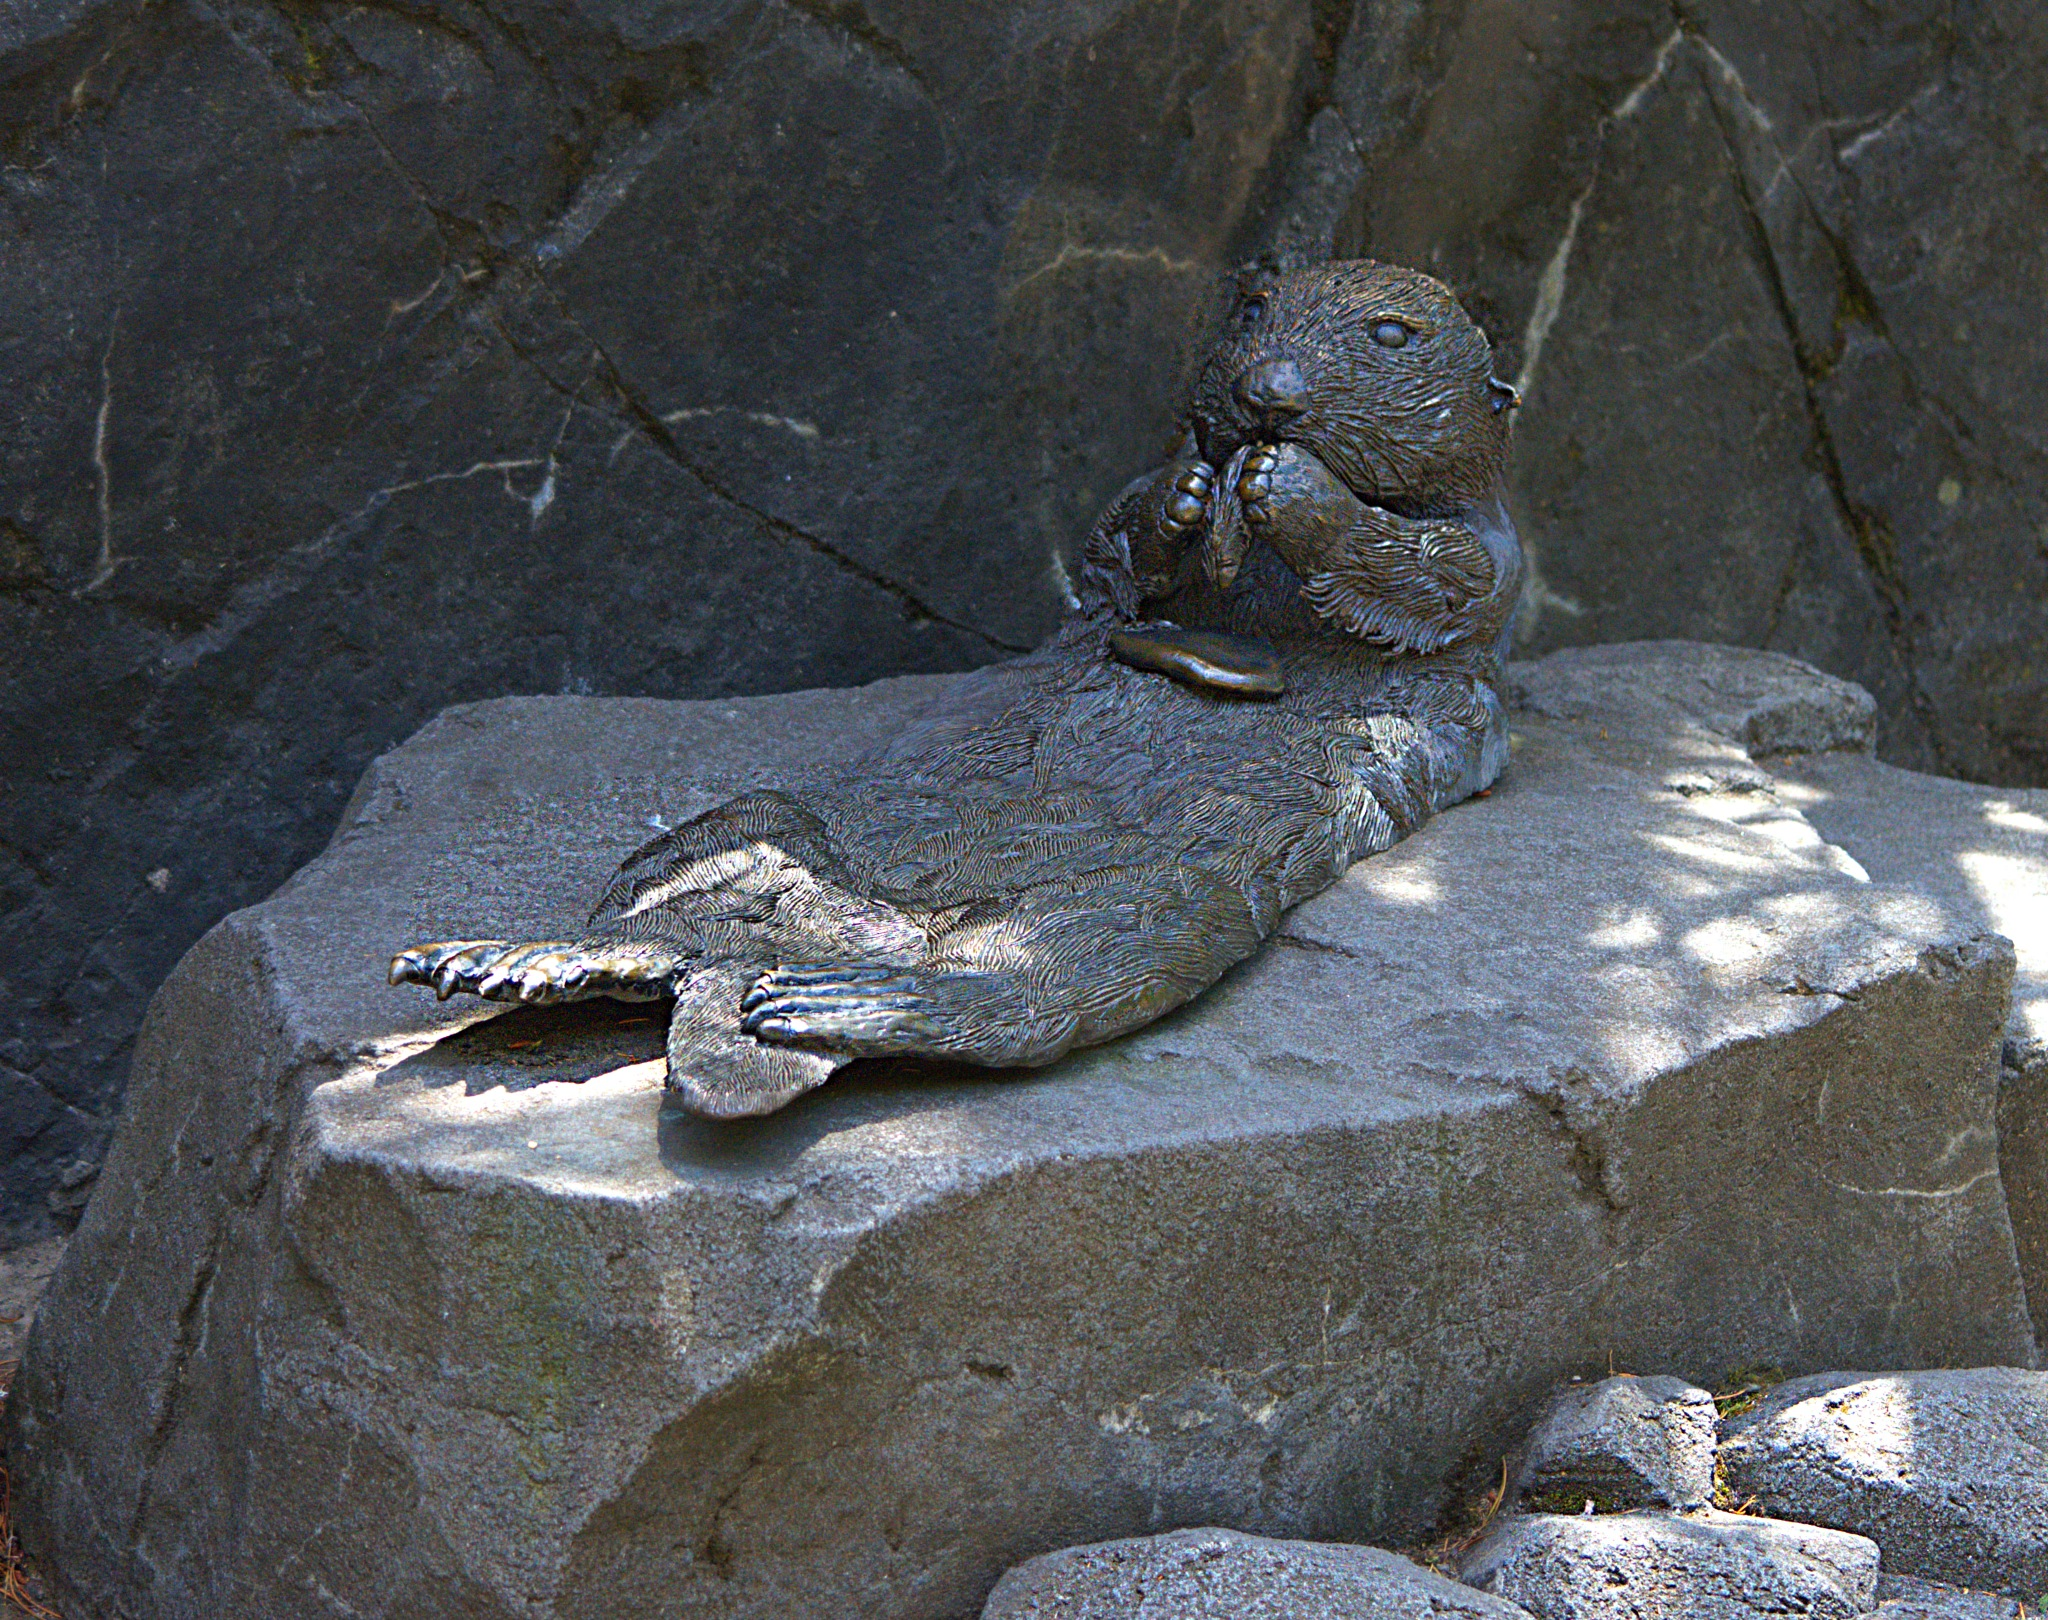 Otter Art by pscottwong